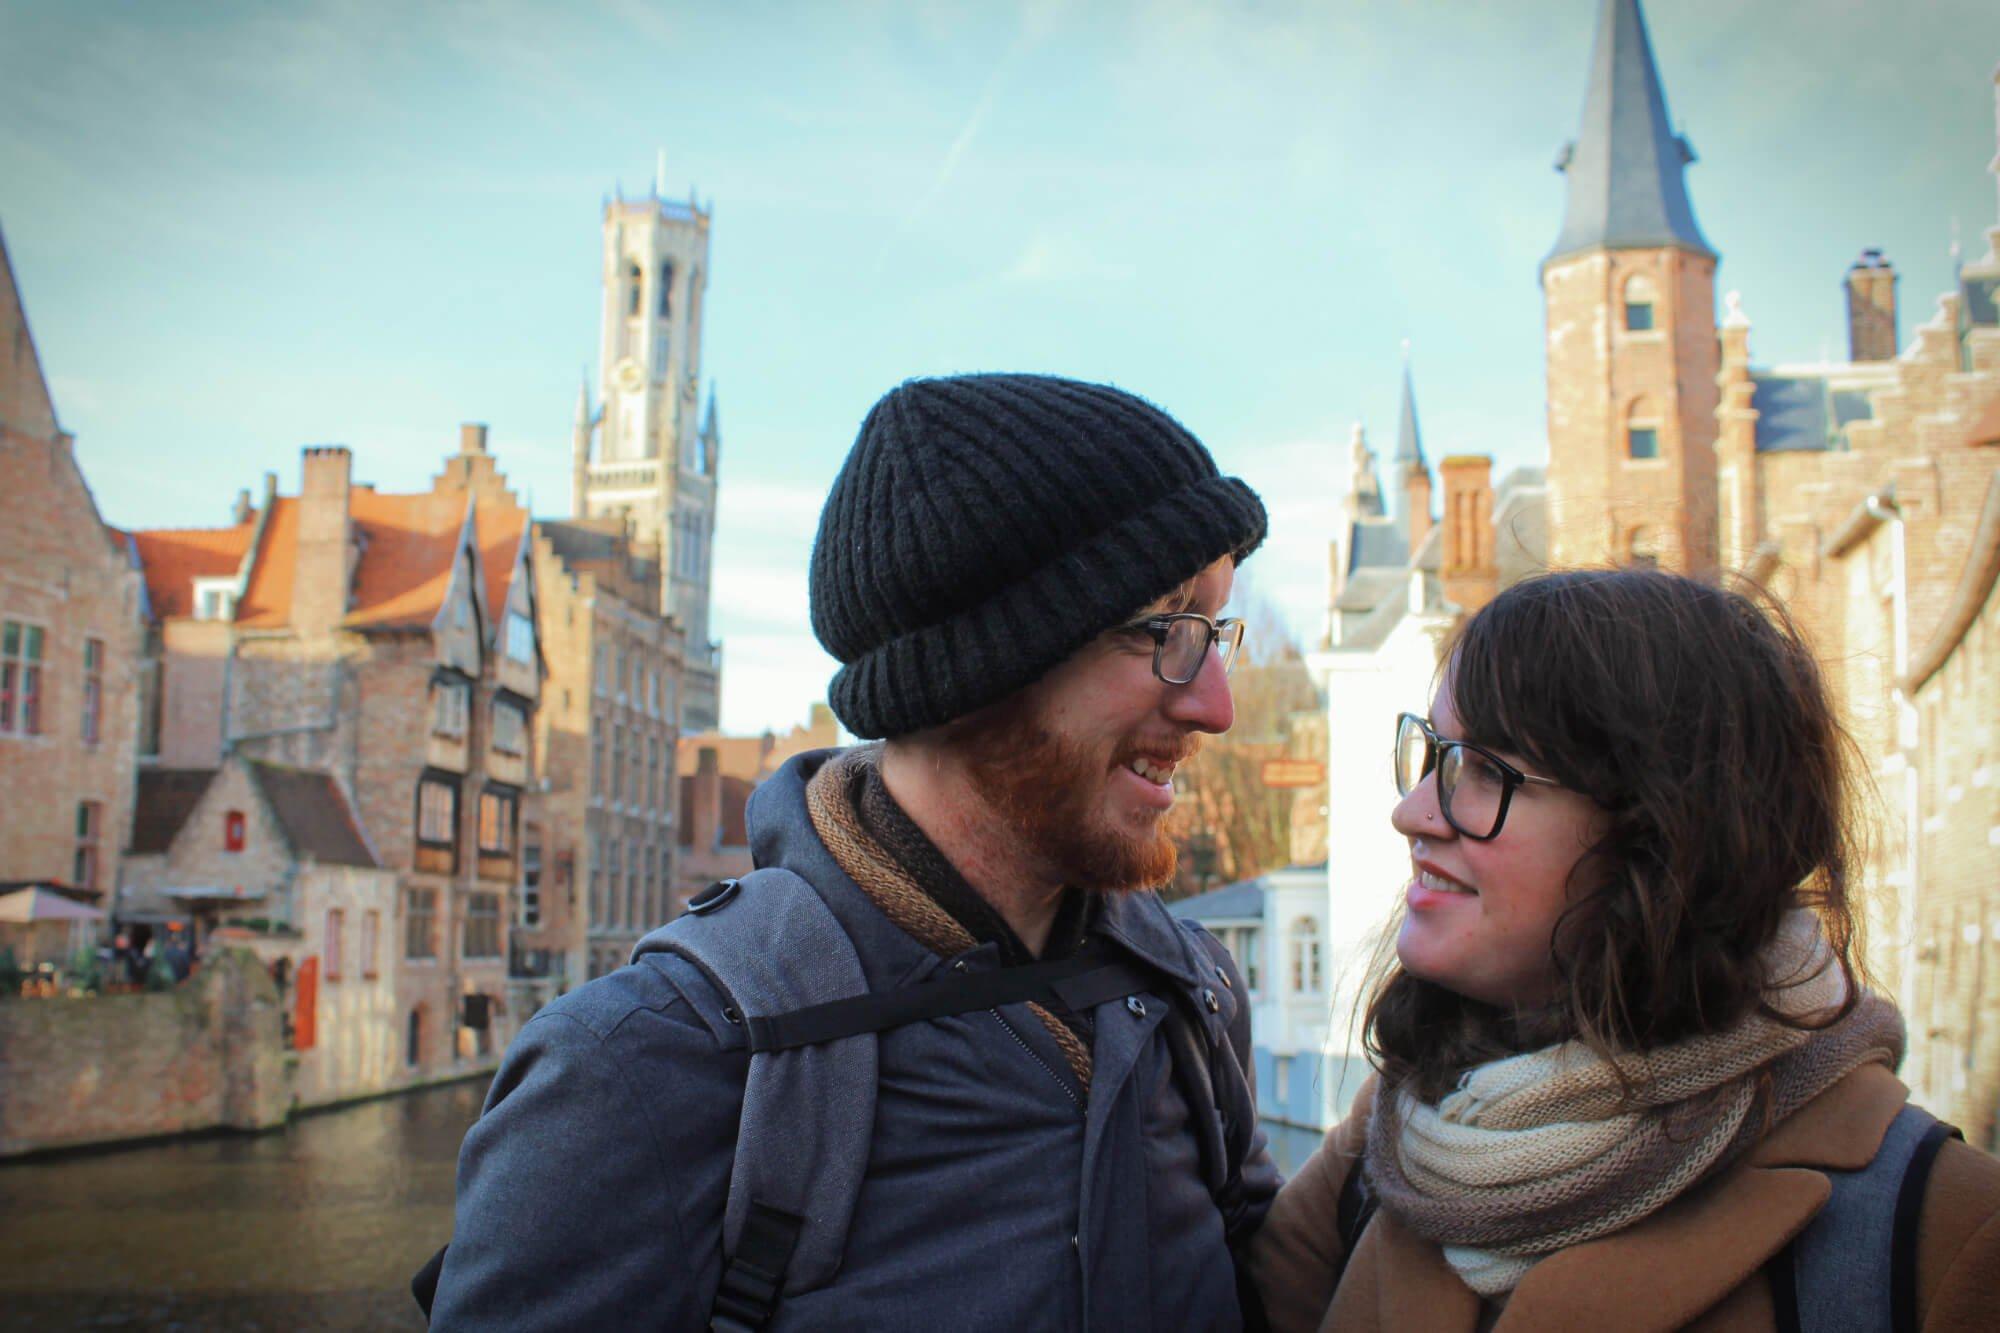 Lia & Jeremy from Practical Wanderlust travel blog in Brugges, Belgium.